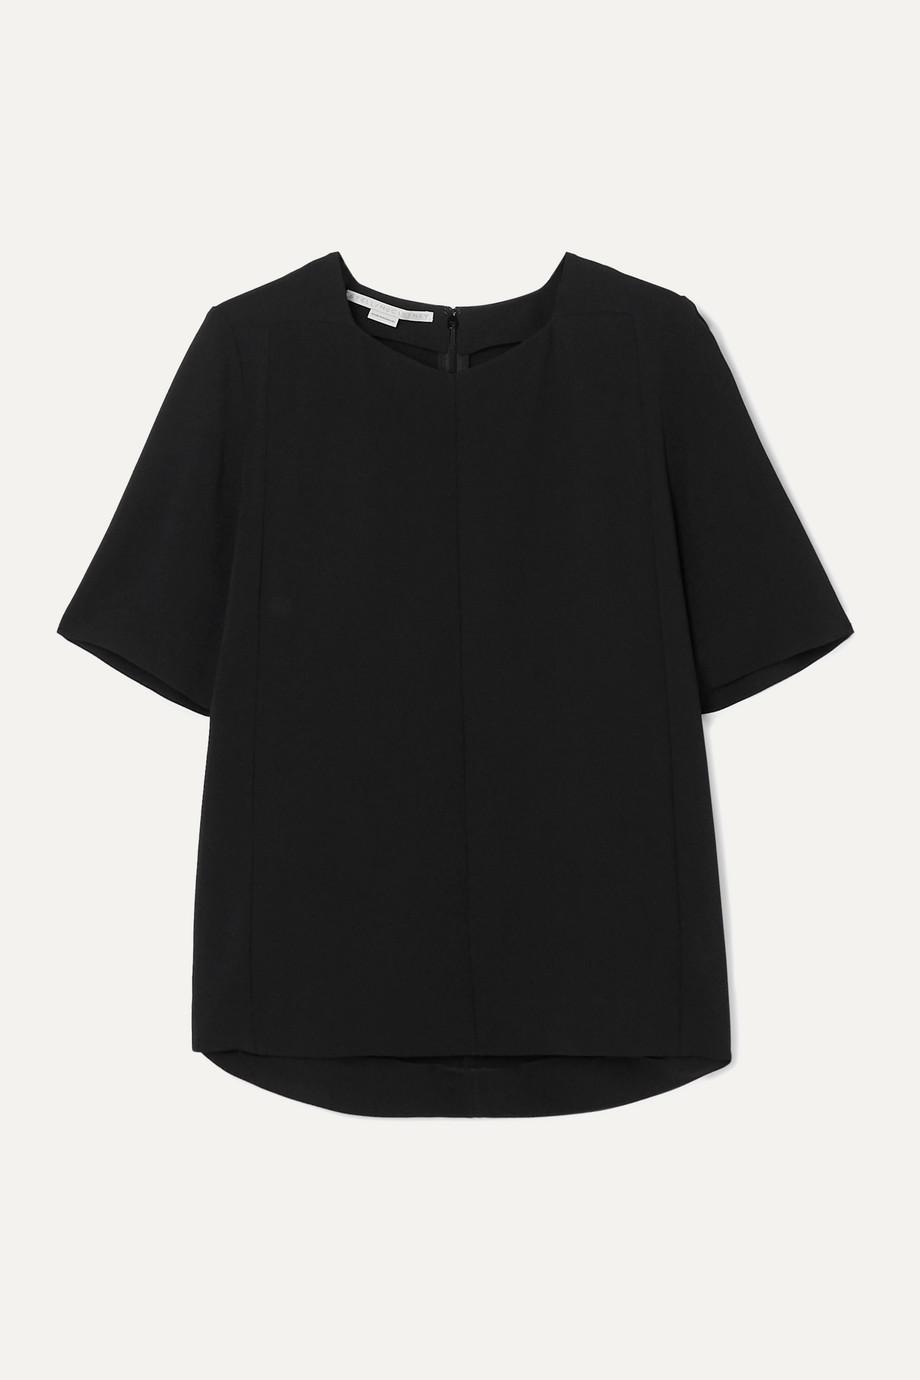 Stella McCartney + NET SUSTAIN cady blouse